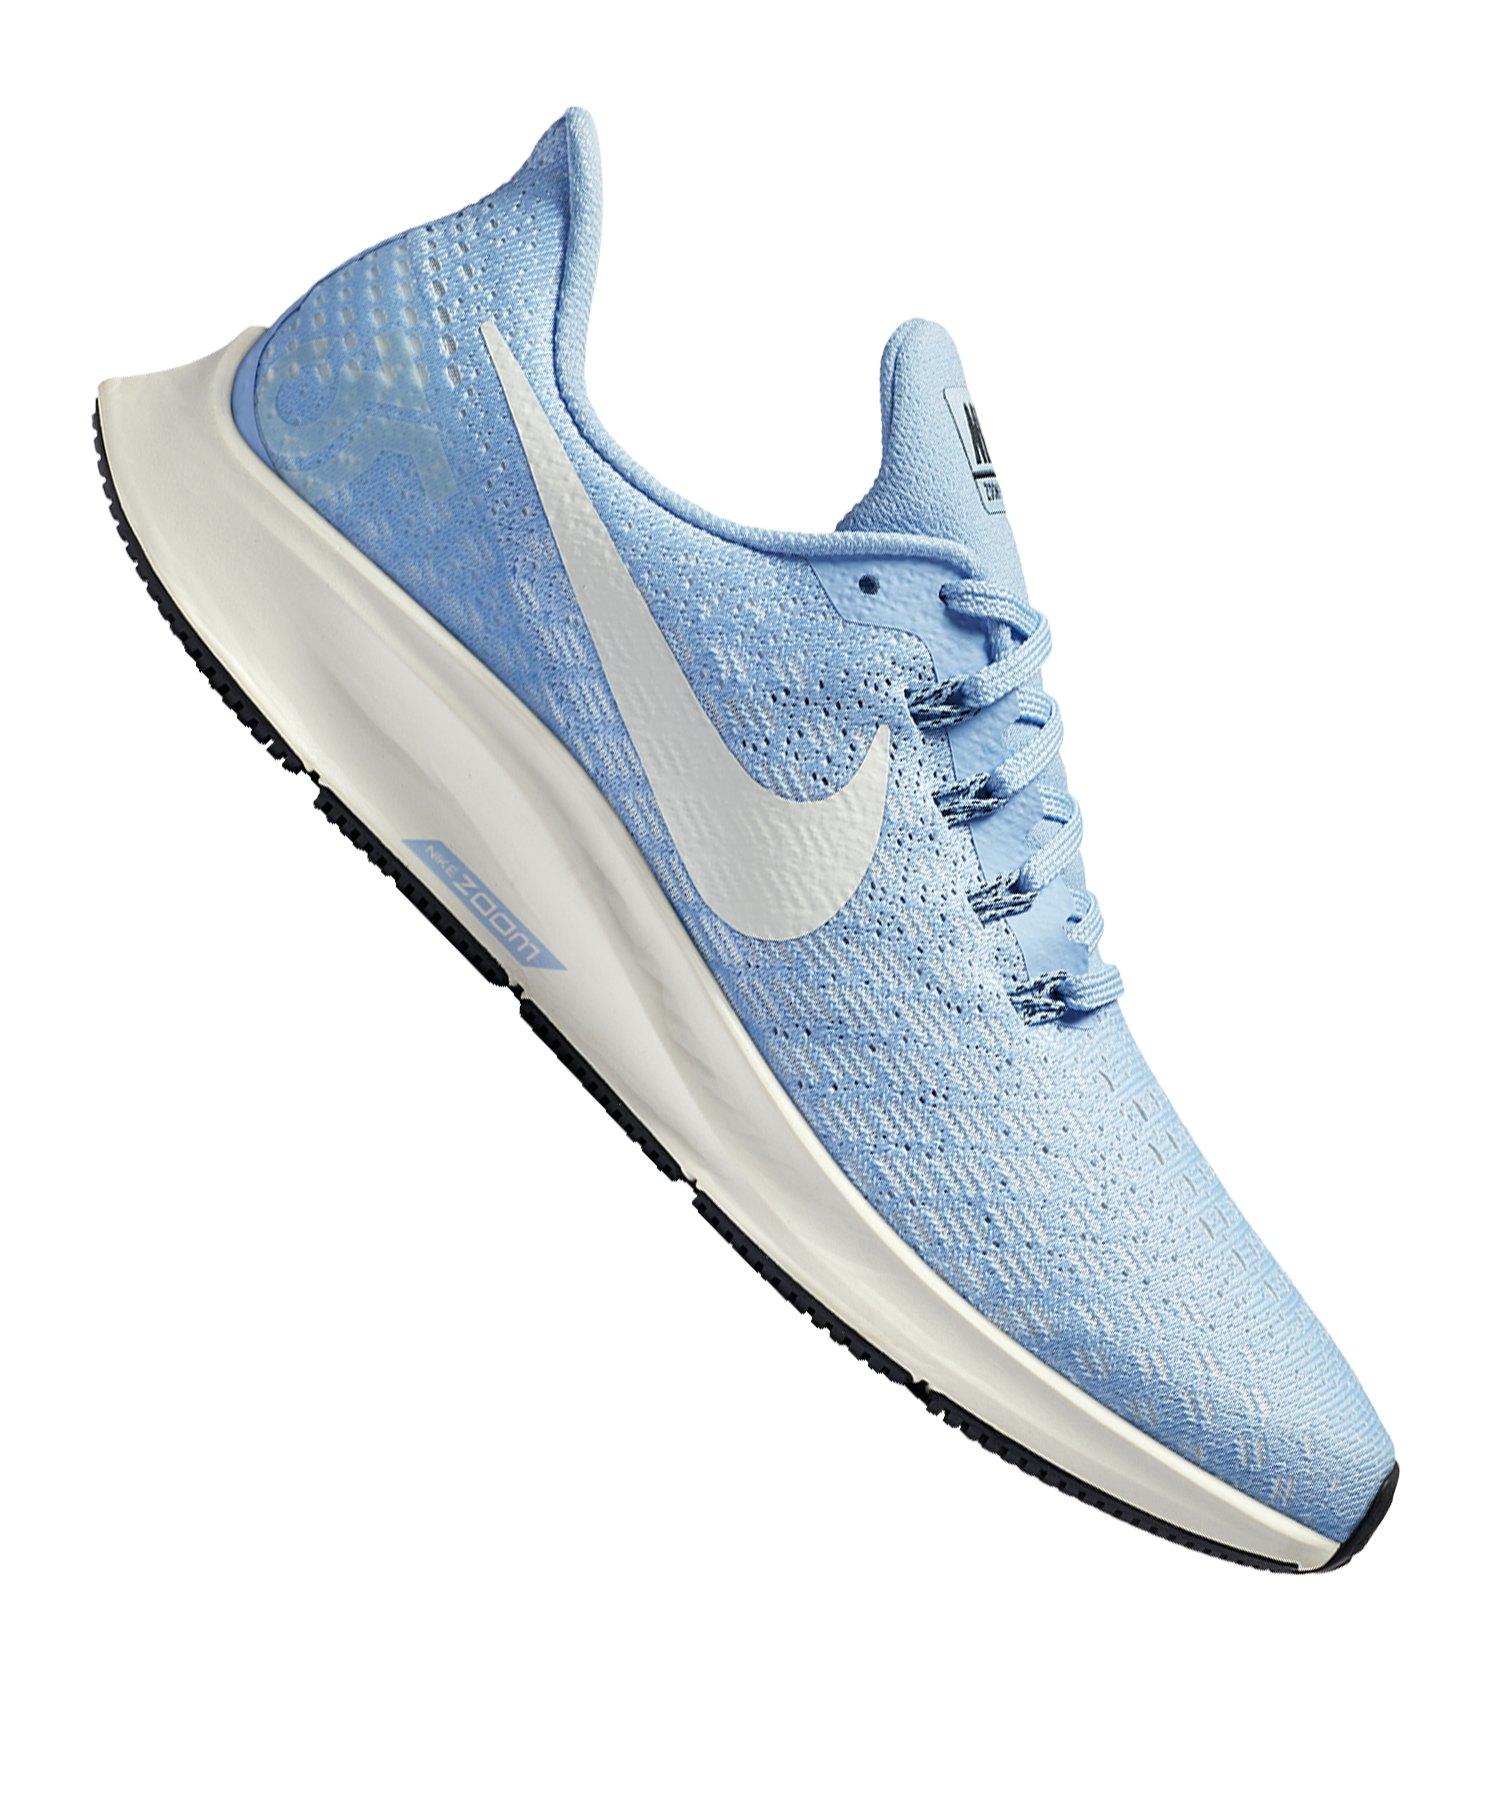 Nike Air Zoom Pegasus 35 Running Damen Blau F405 |Laufen ...